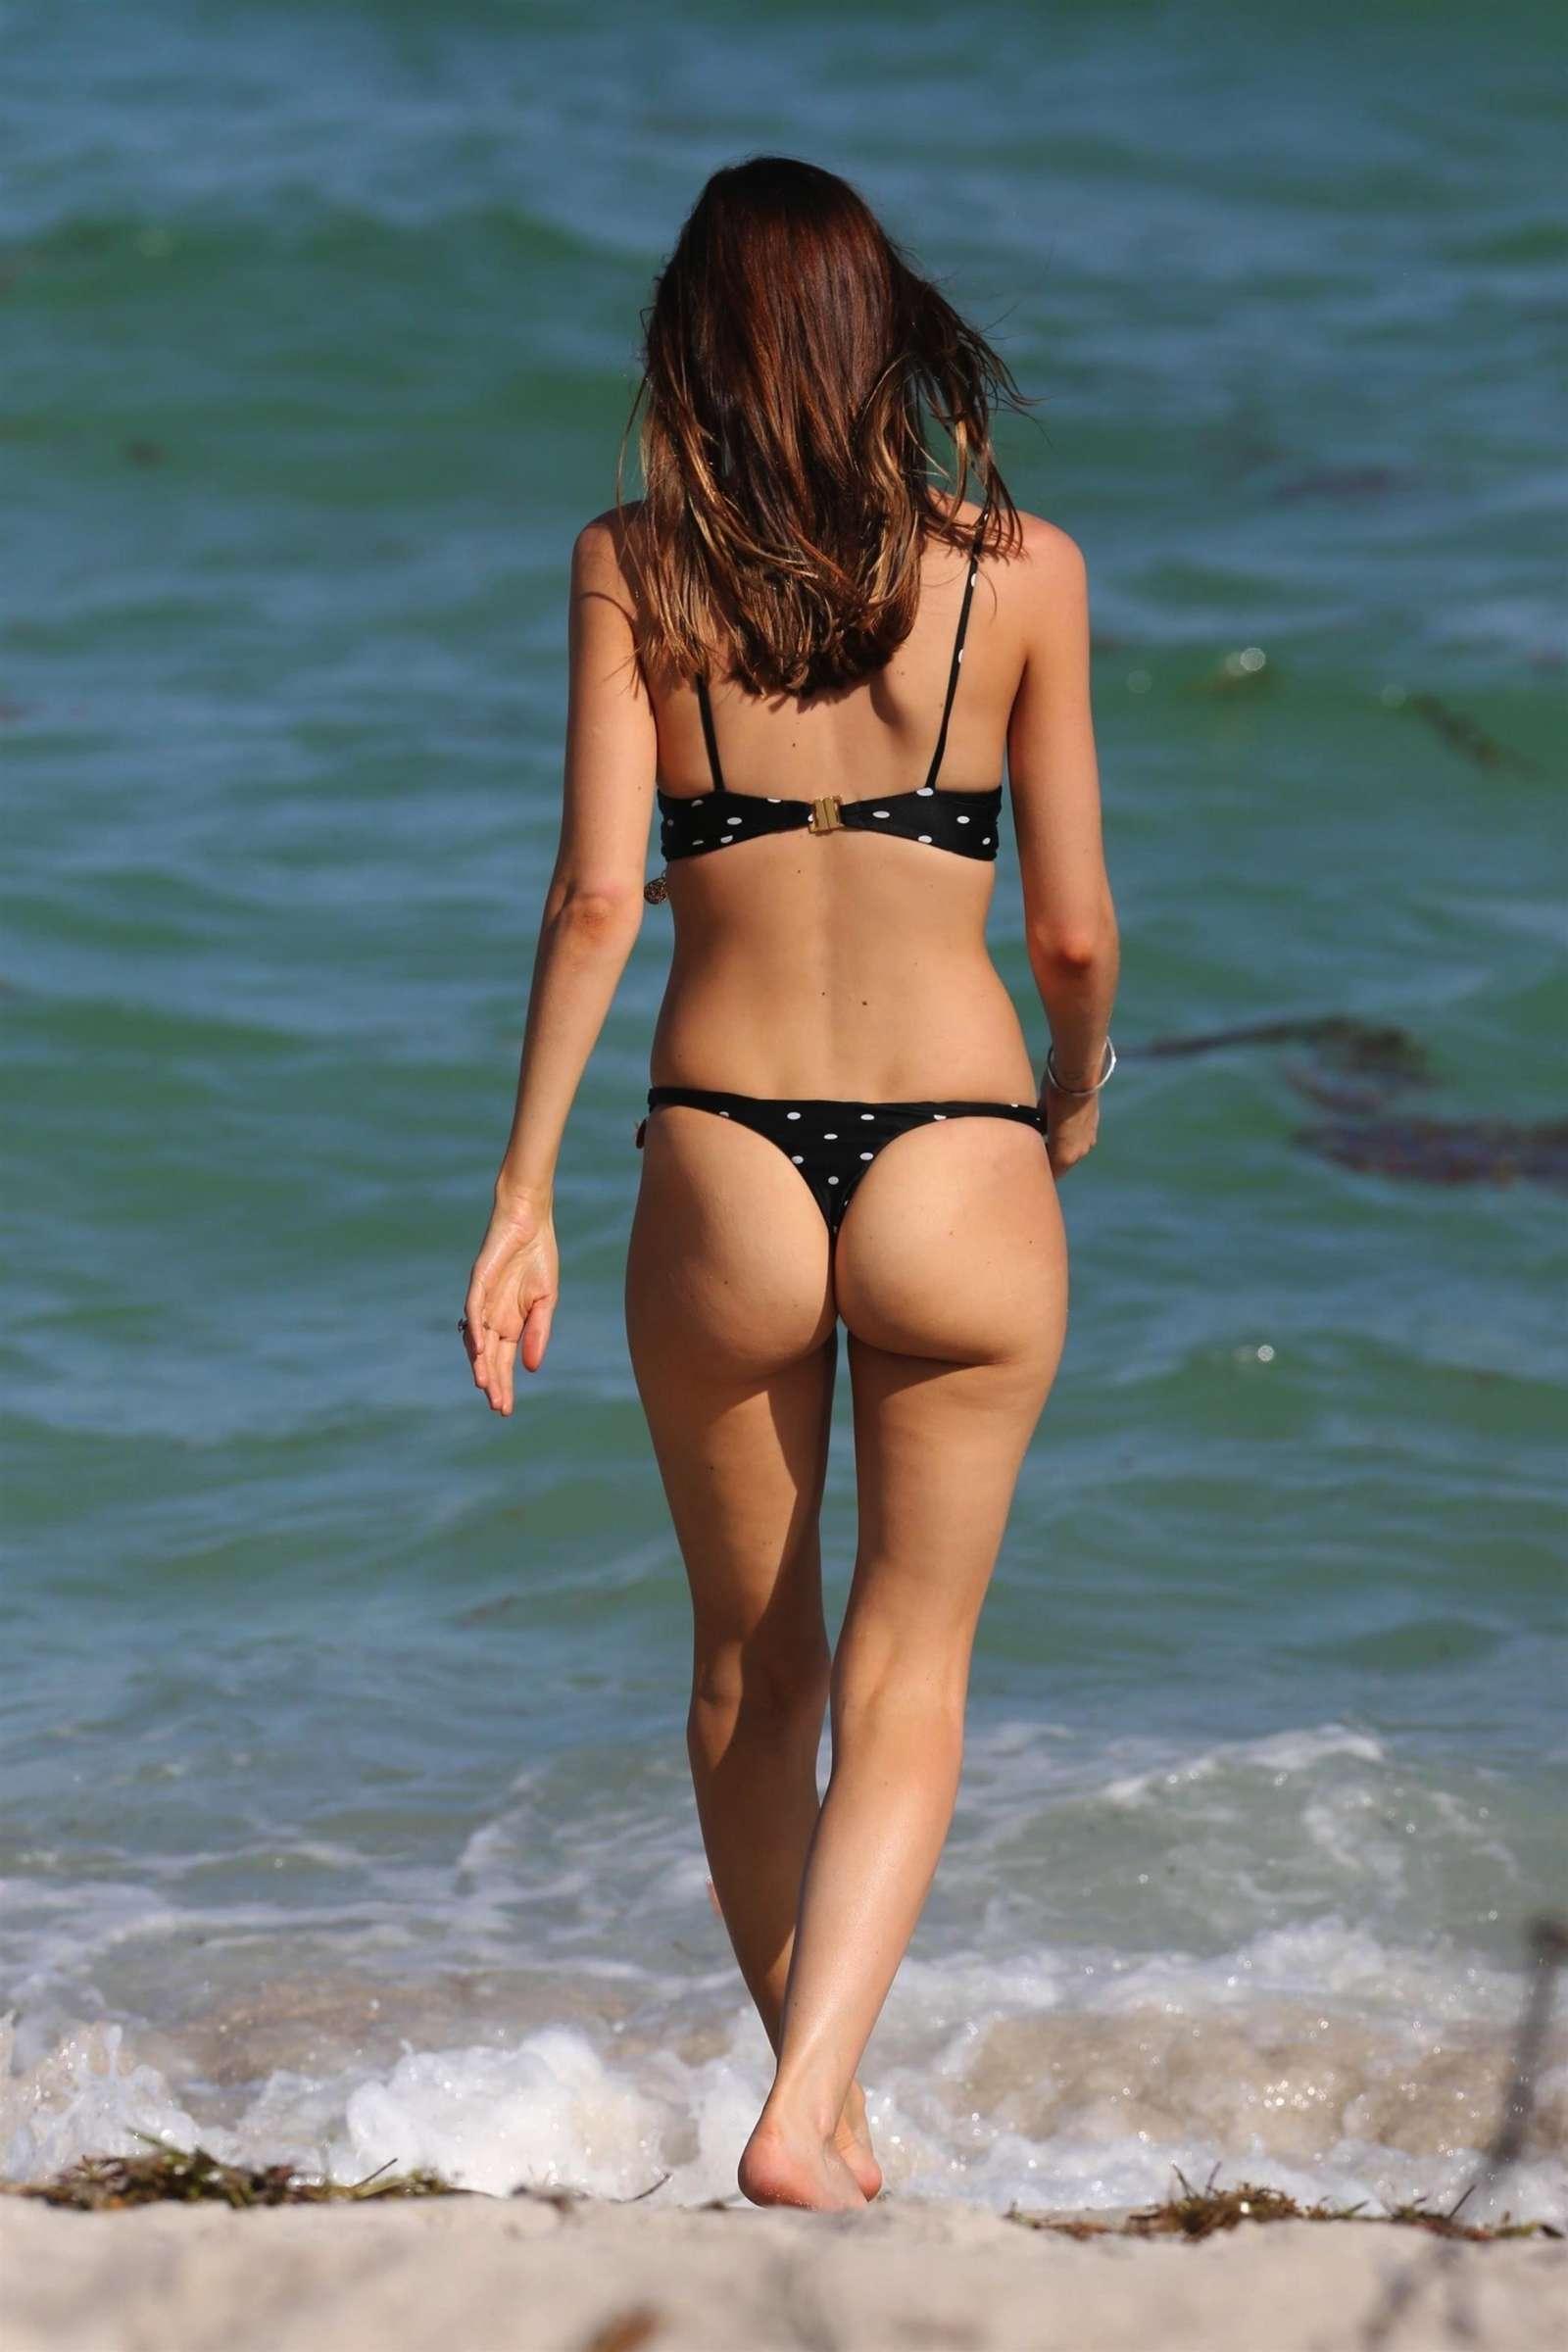 Alice Amelie in Bikini on the beach in Miami Pic 8 of 35